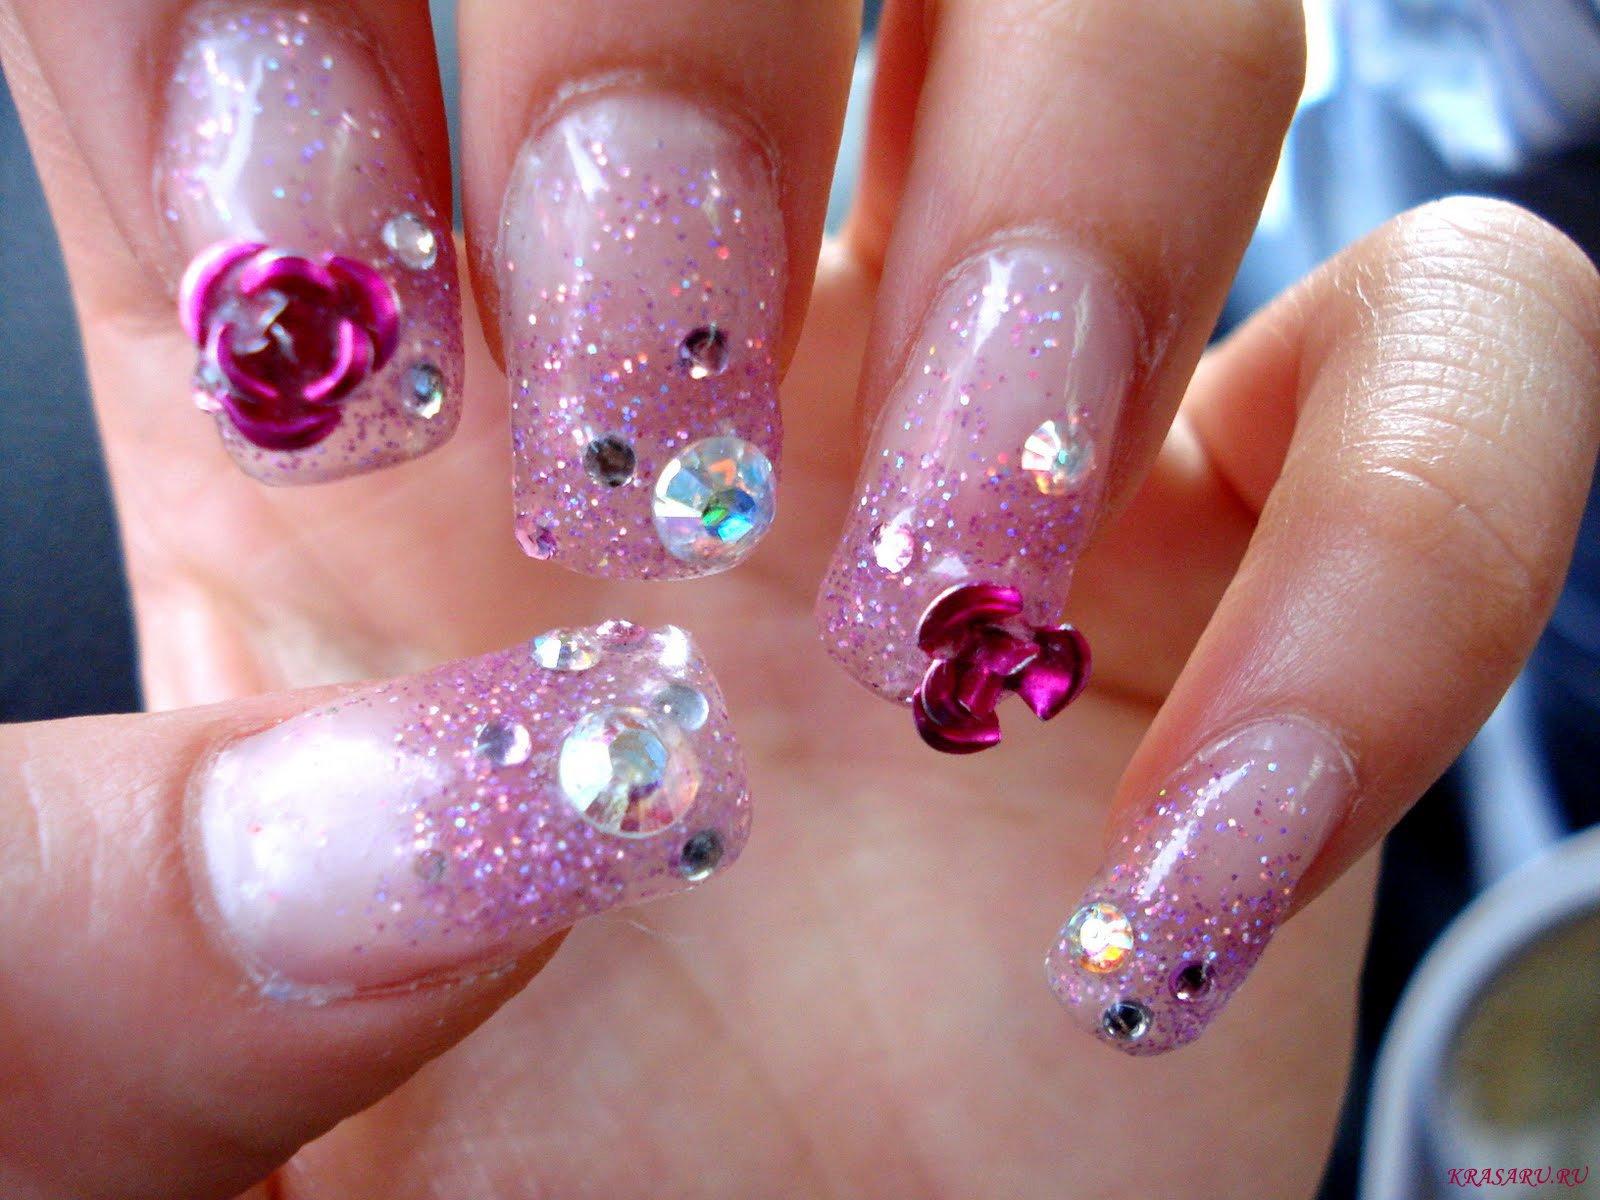 Аквариум дизайн ногтей фото